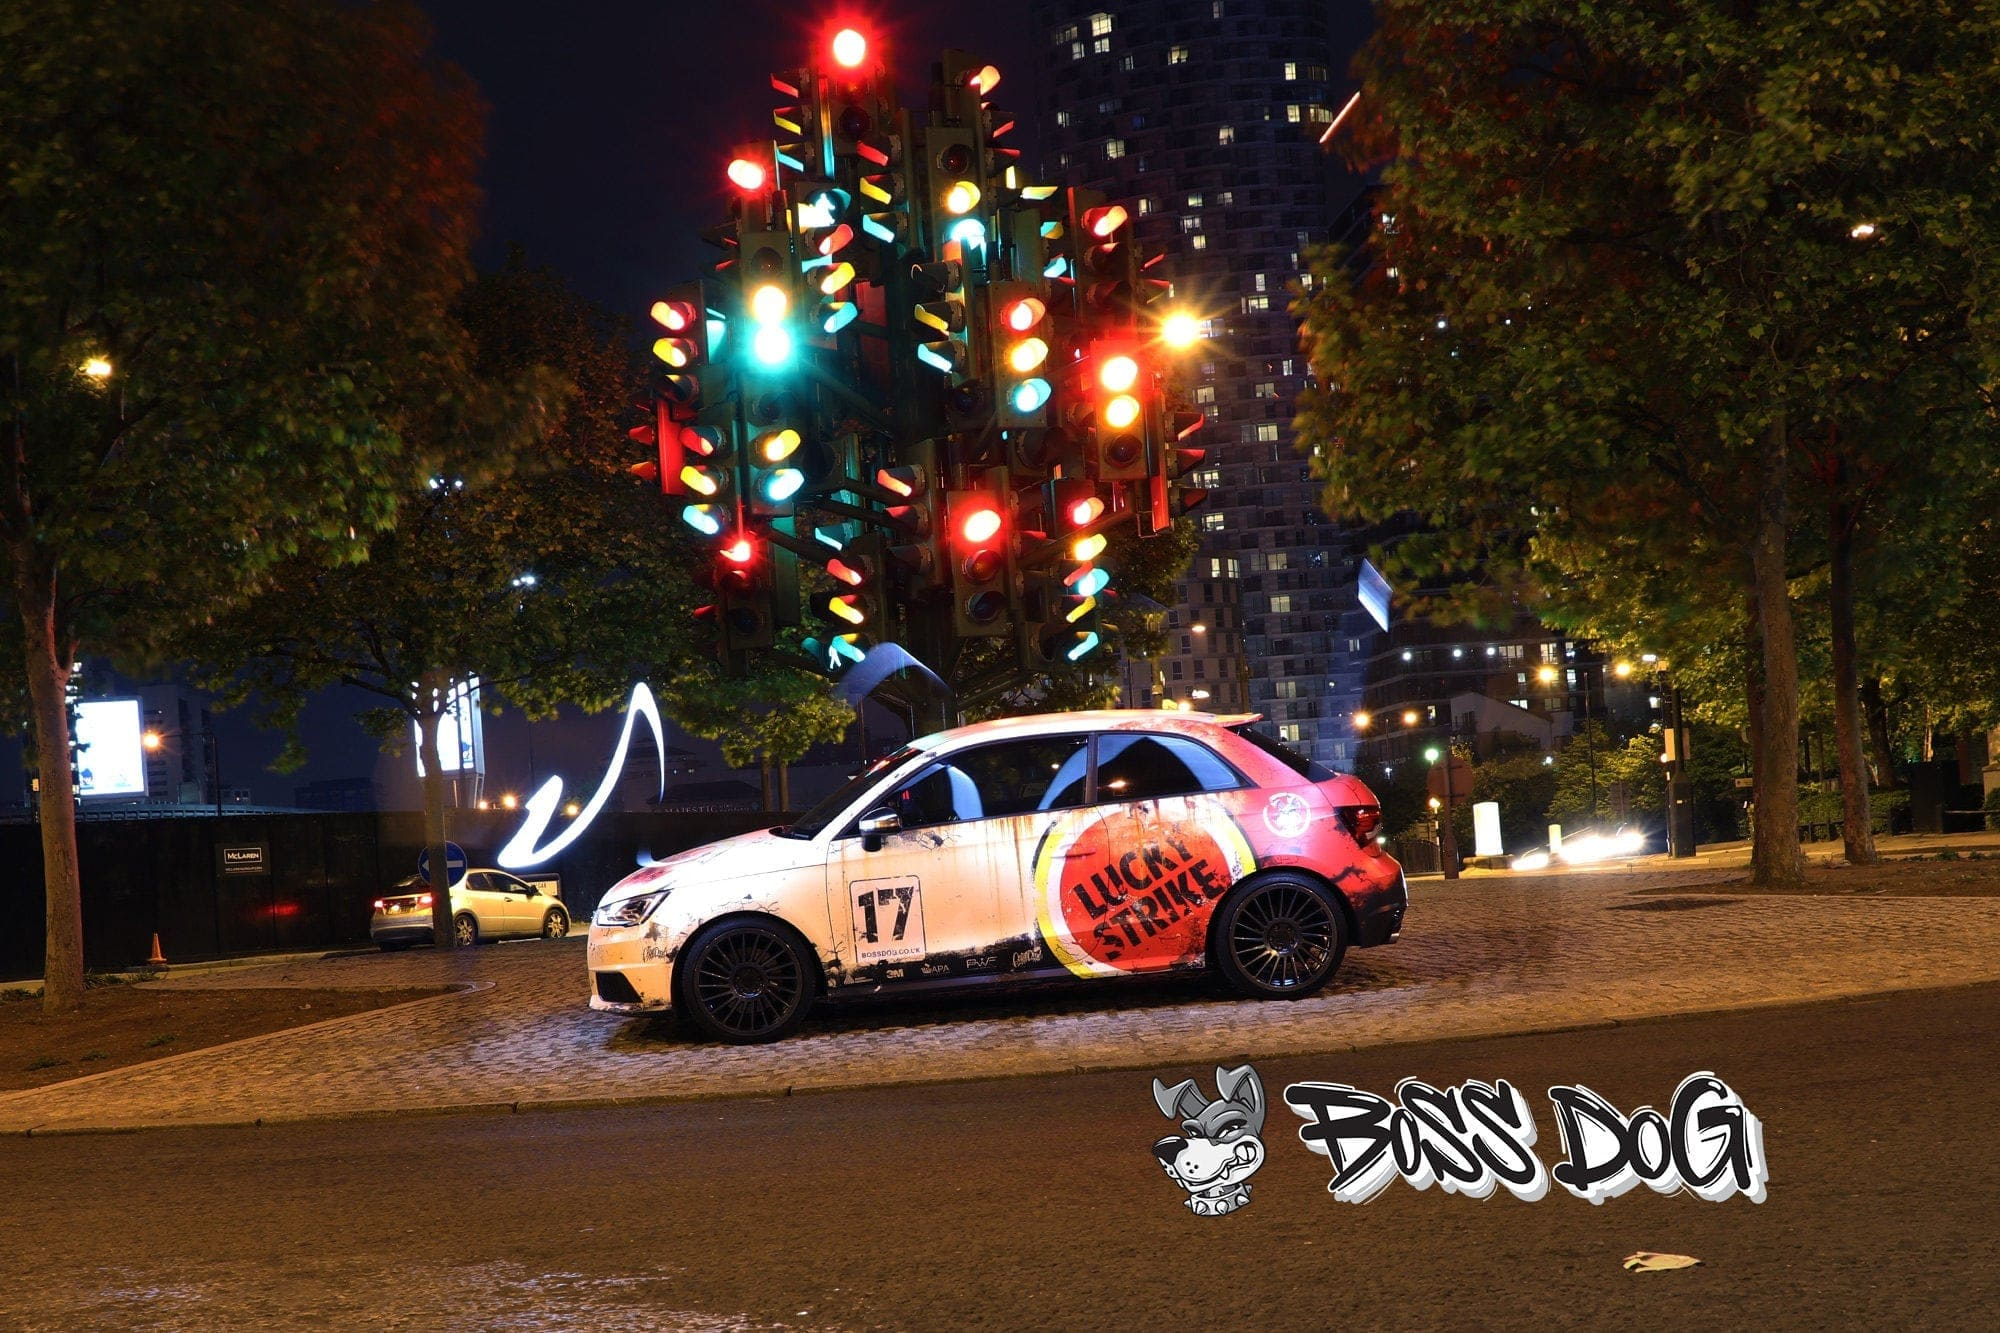 Audi S1 full wrap digital print rusty racing livery